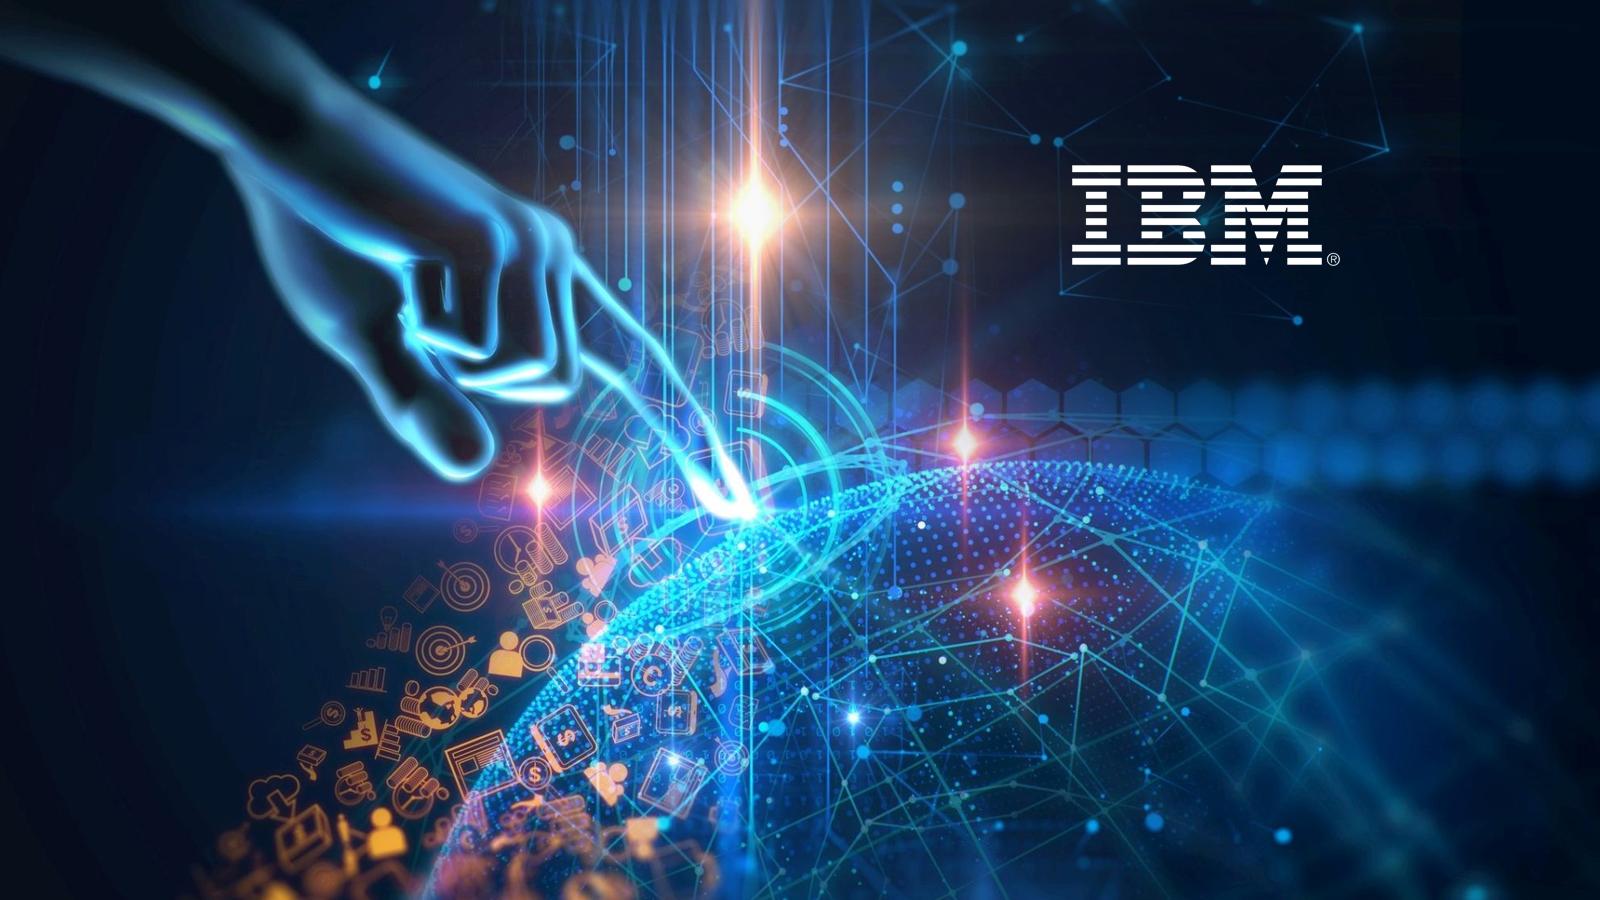 IBM.OpenScale.jpg (706 KB)